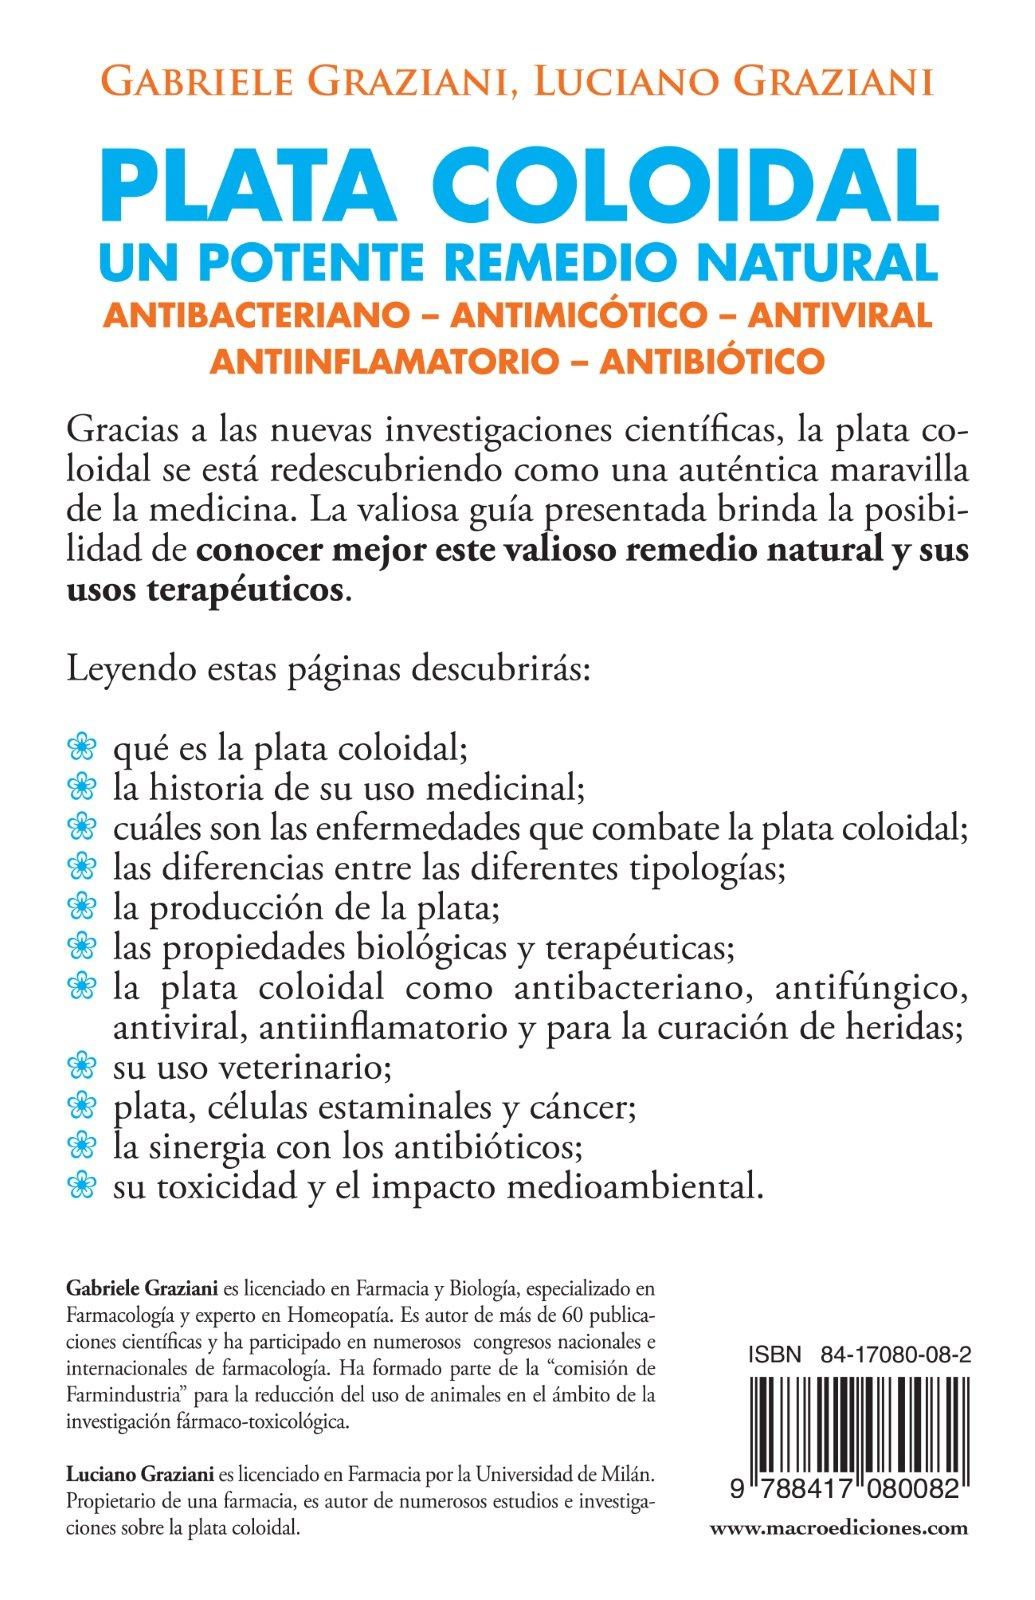 Plata coloidal: un potente remedio natural Guía del Bienestar: Amazon.es: Luciano Graziani: Libros